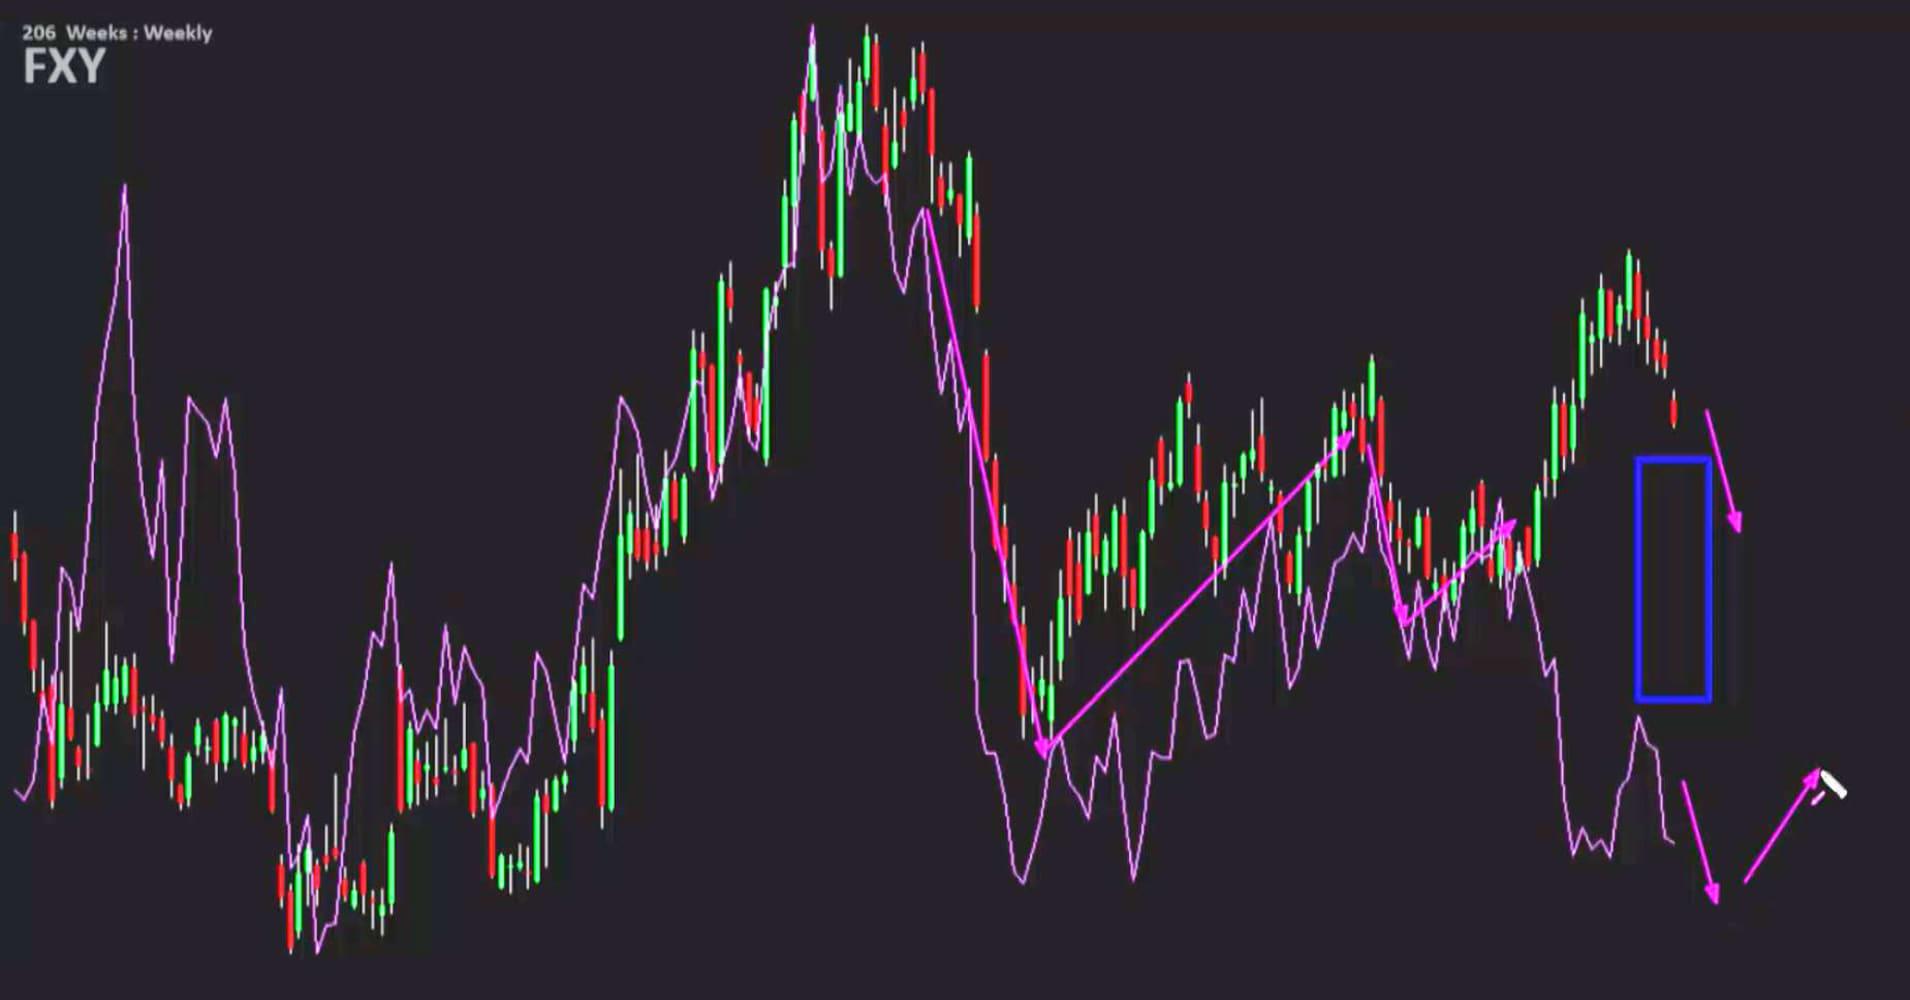 Cnbc forex market